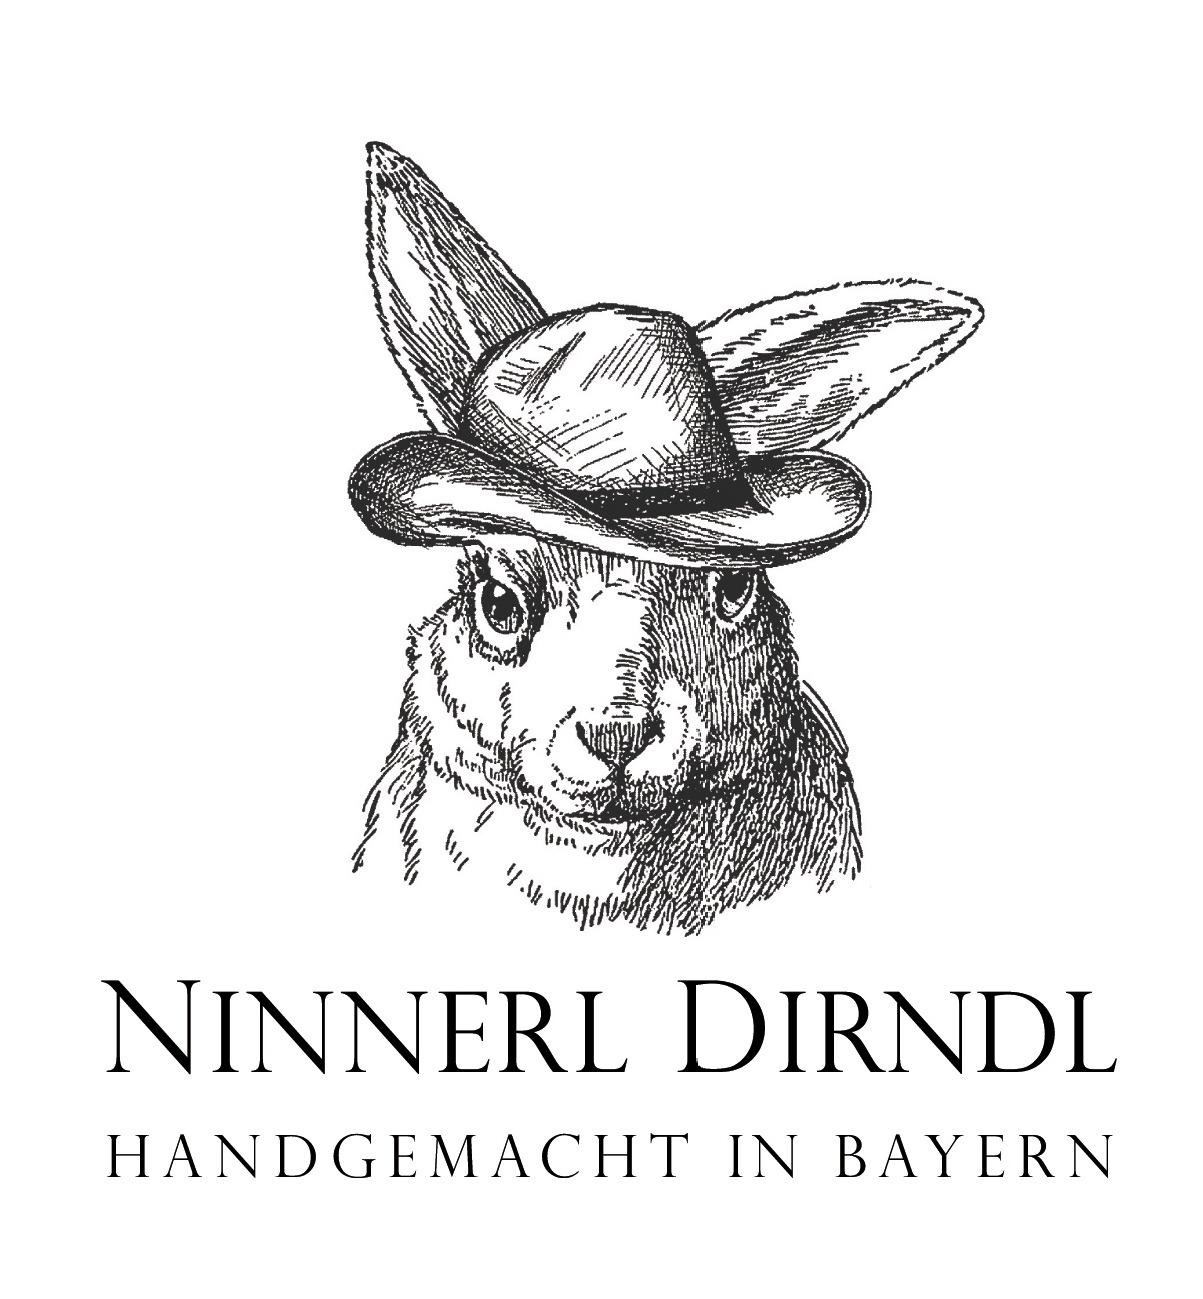 Ninnerl